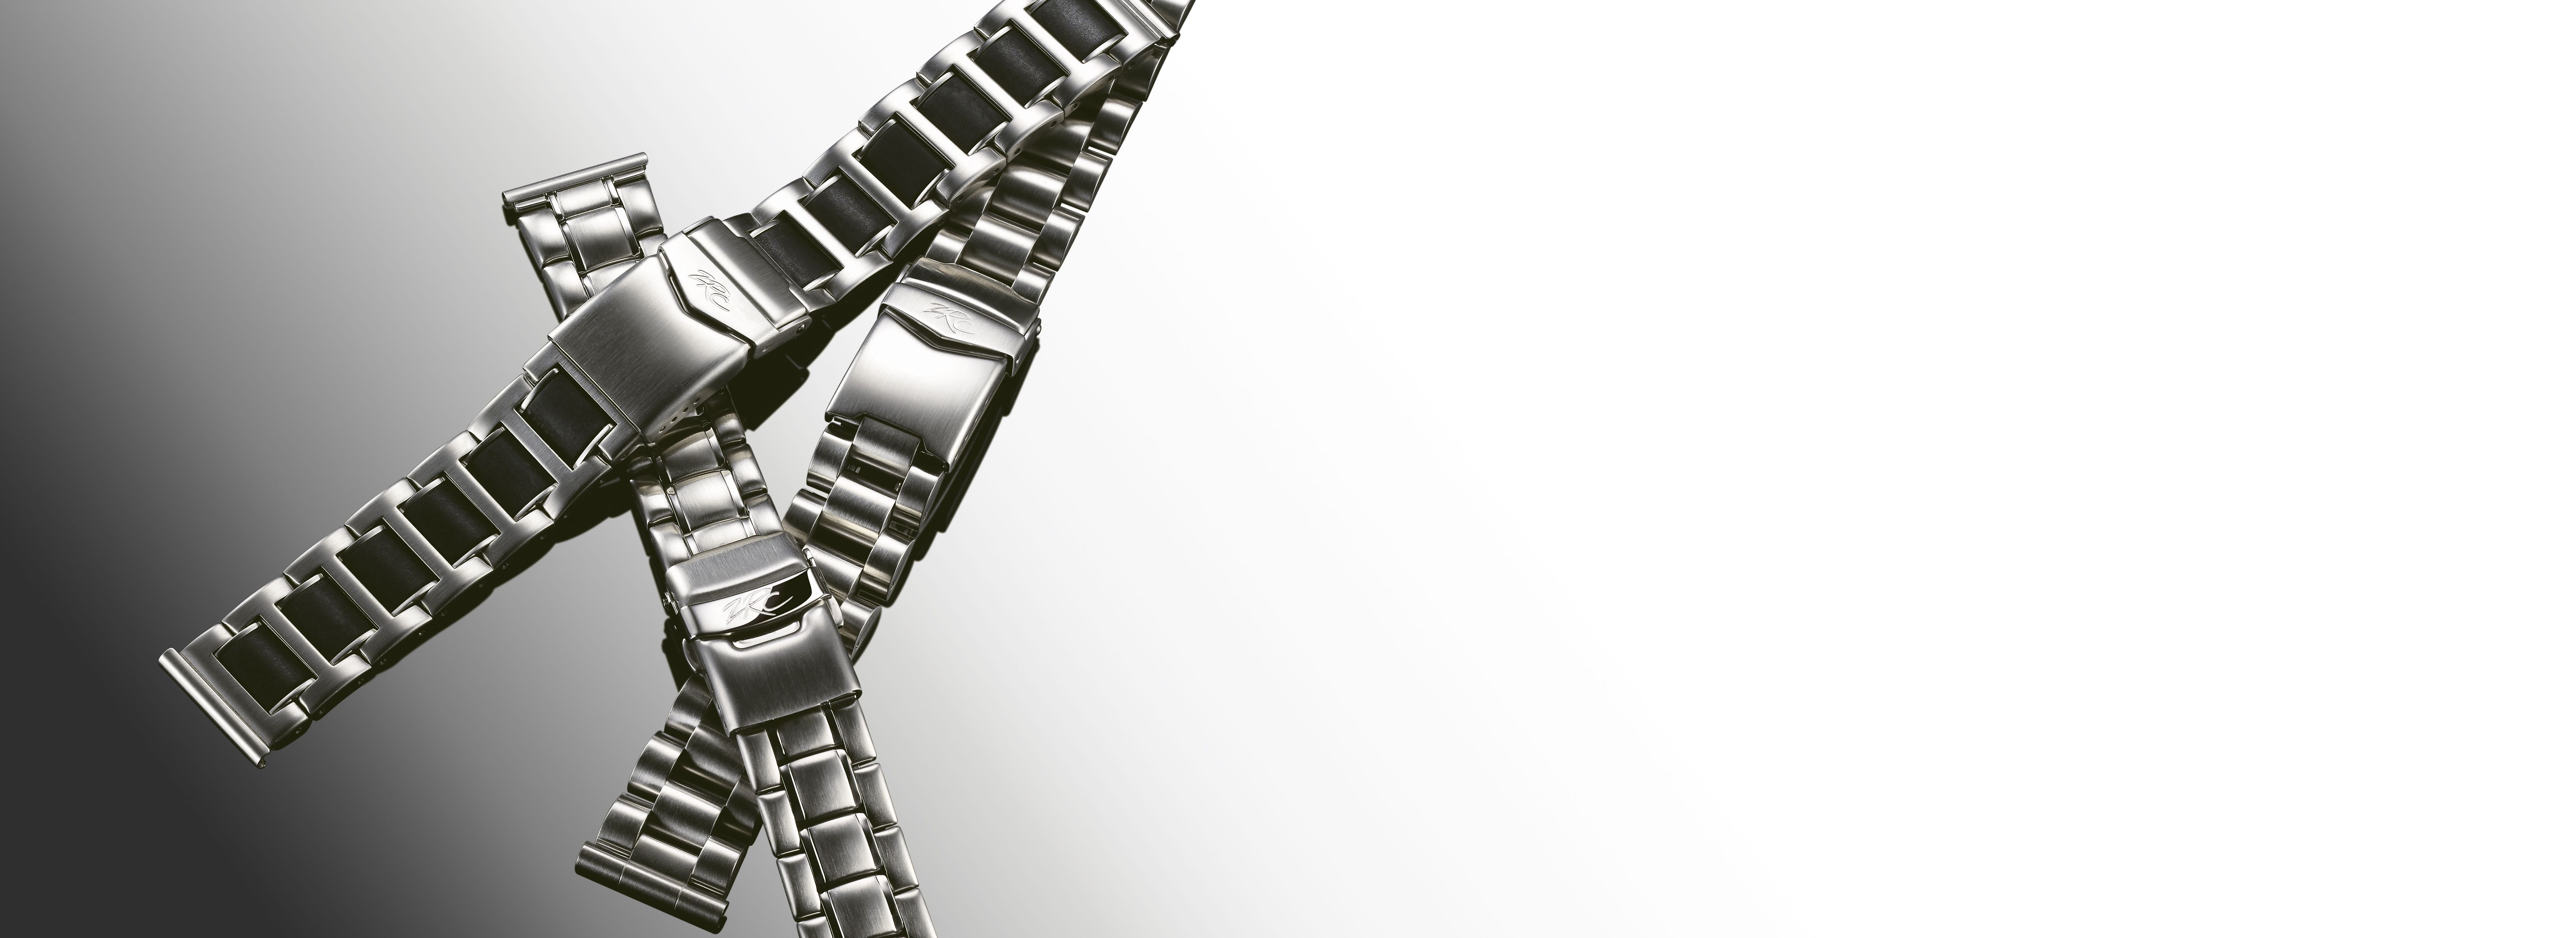 ZRC1904-Metal-compressor.jpg#asset:9732